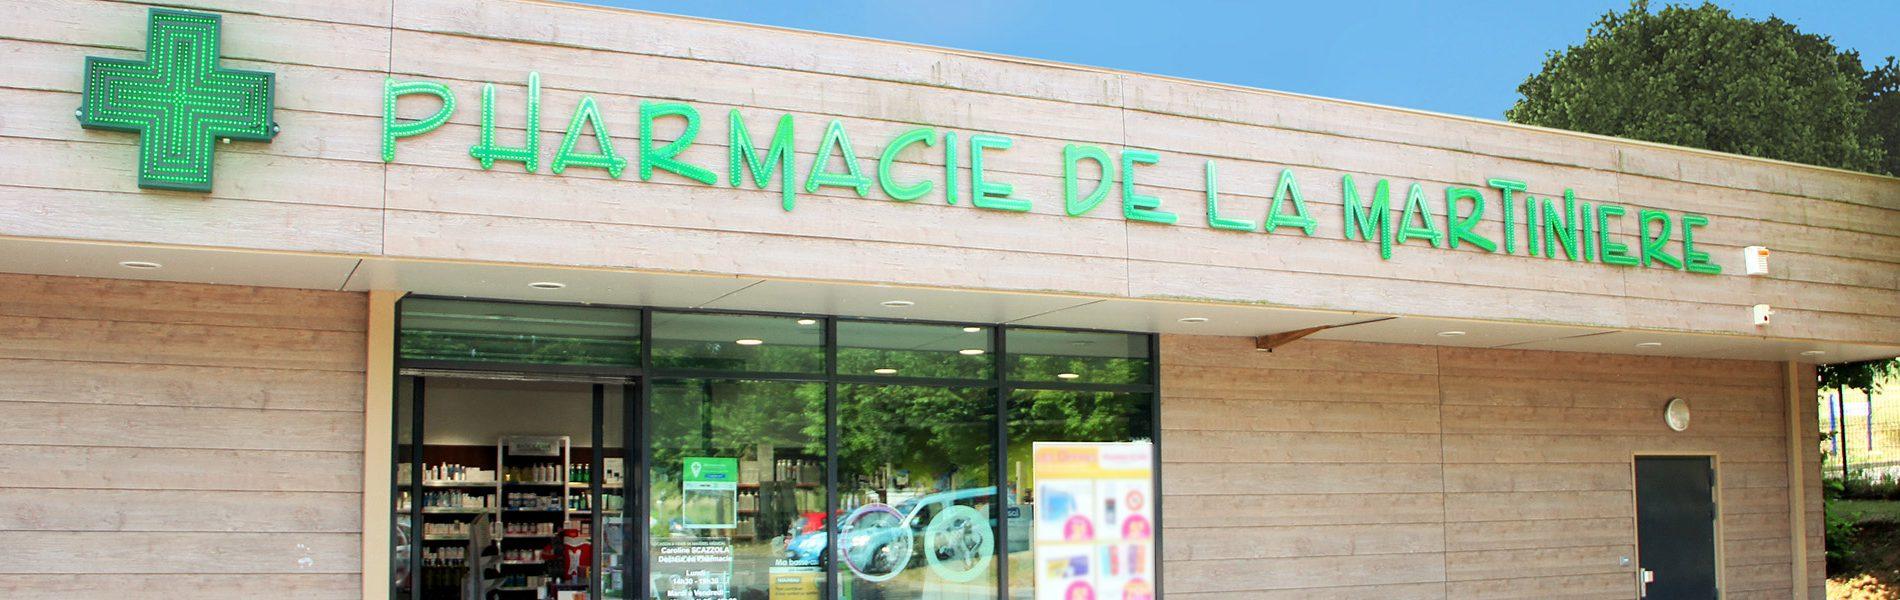 Pharmacie DE LA MARTINIERE - Image Homepage 1